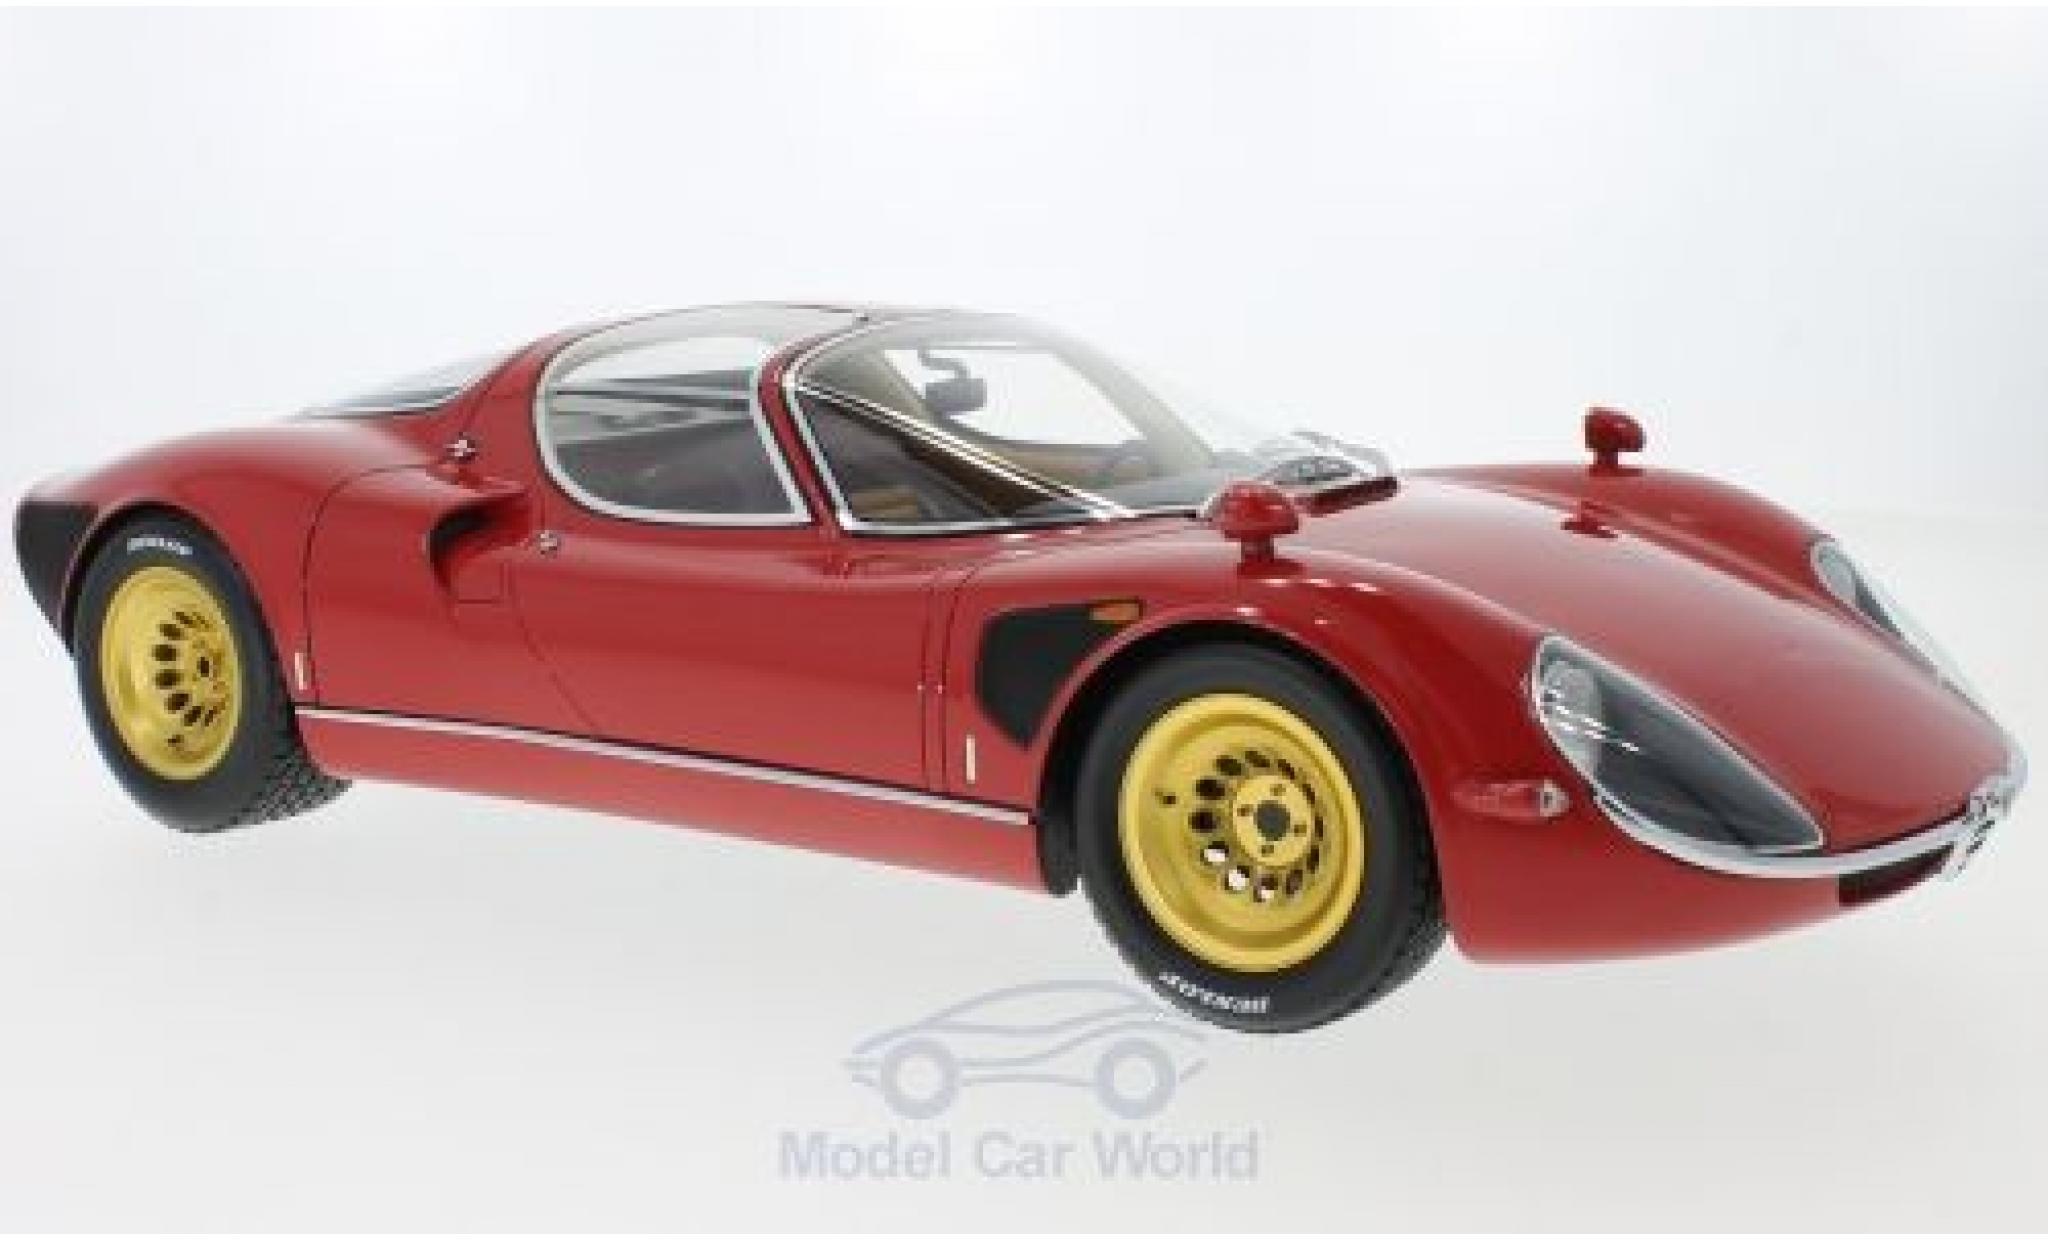 Alfa Romeo T33 1/18 Premium ClassiXXs Tipo 33 Stradale rouge 1967 mit goldenen Felgen